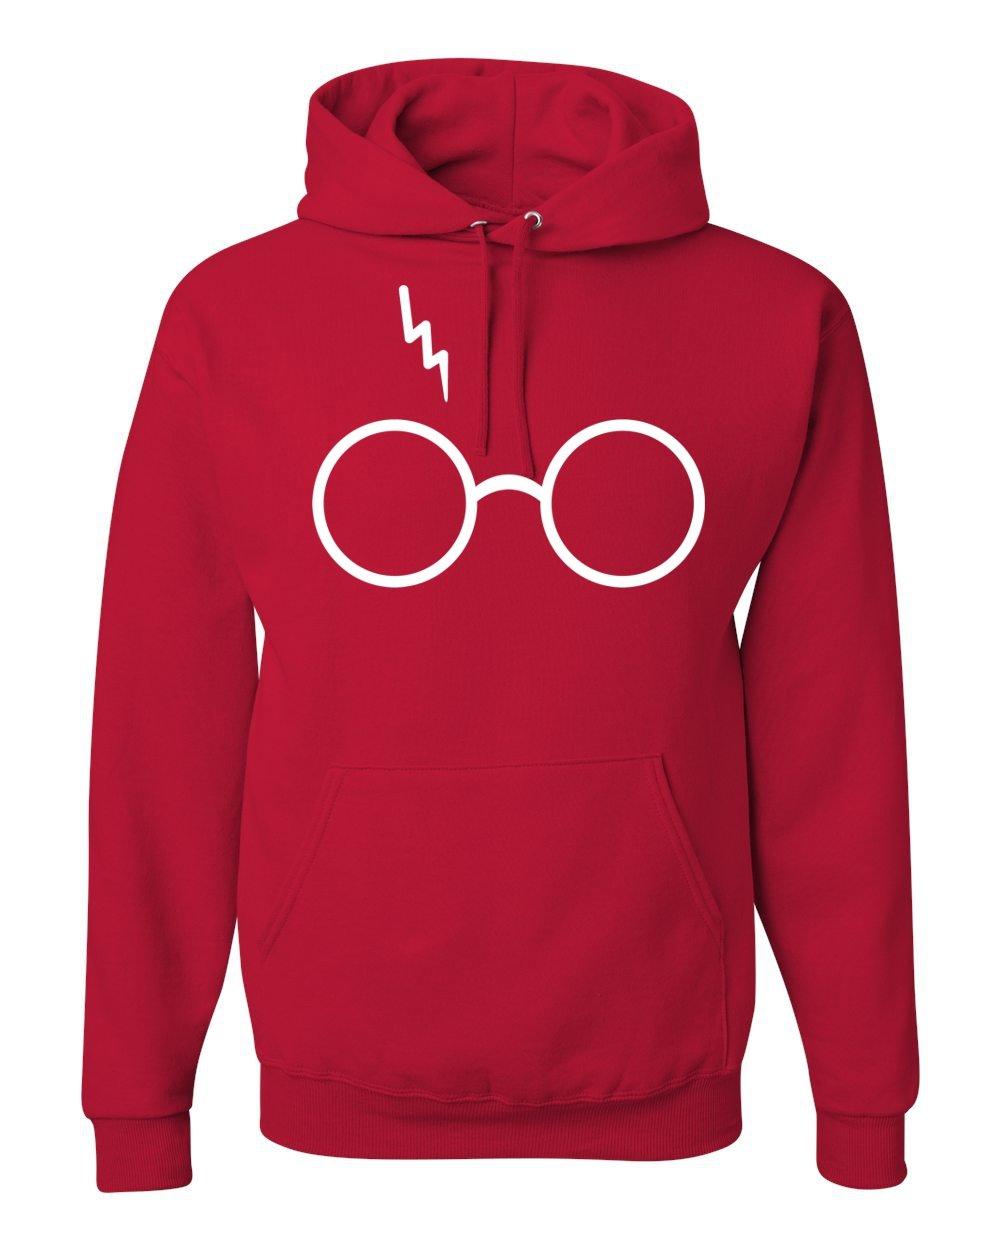 Harry Potter Glasses Scar Unisex Hooded Sweatshirt Fashion Hoodie ( Red , Medium )